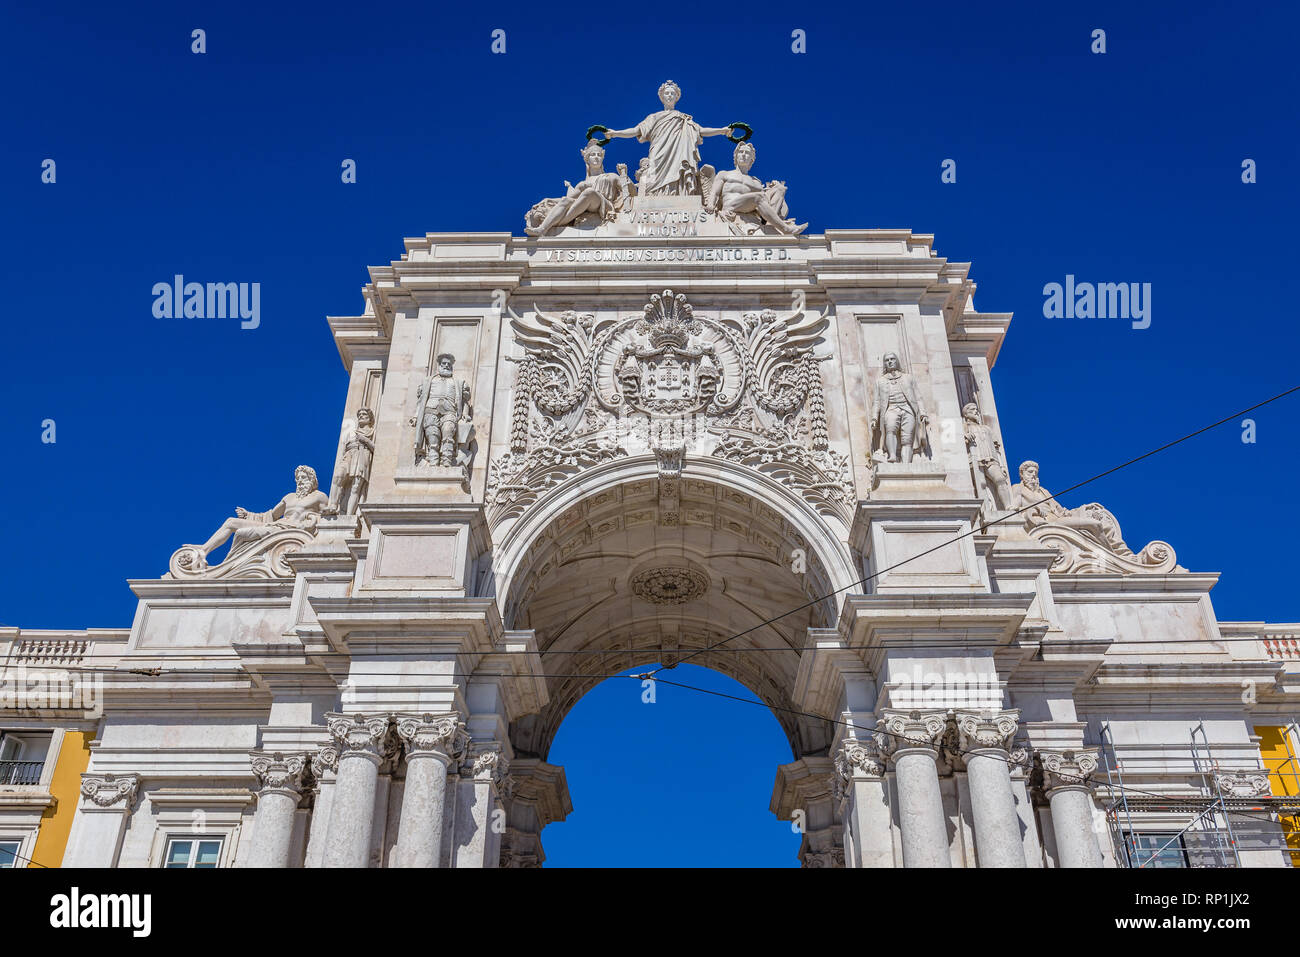 Rua Augusta Arch - Arco da Rua Augusta with statues of Glory rewarding Valor and Genius at Commerce Square - Praca do Comercio in Lisbon, Portugal - Stock Image